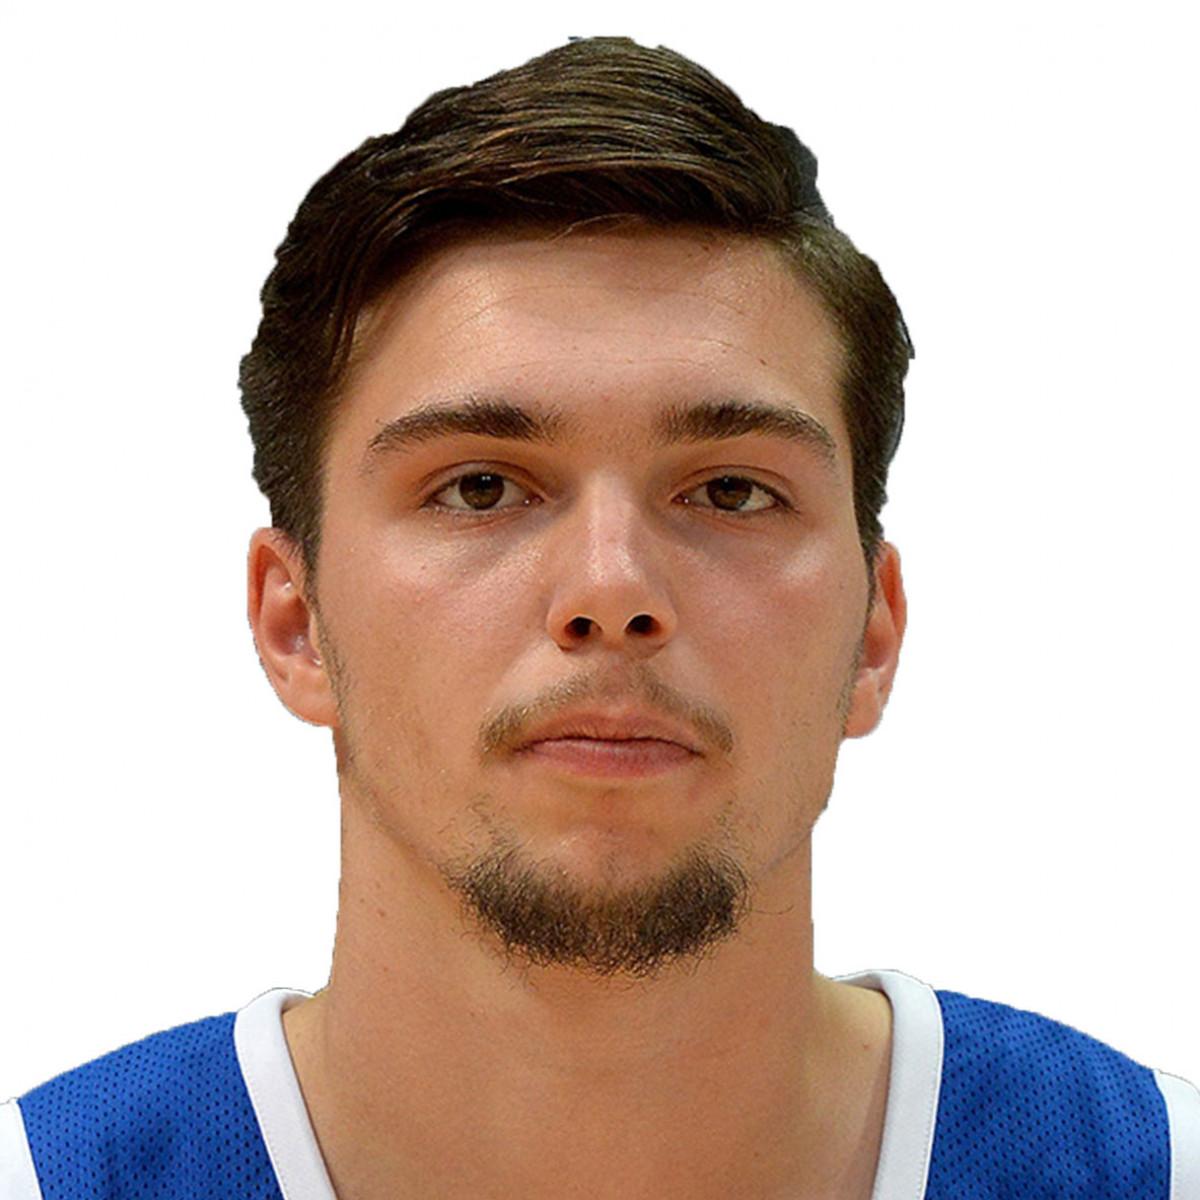 Karlo Uljarevic